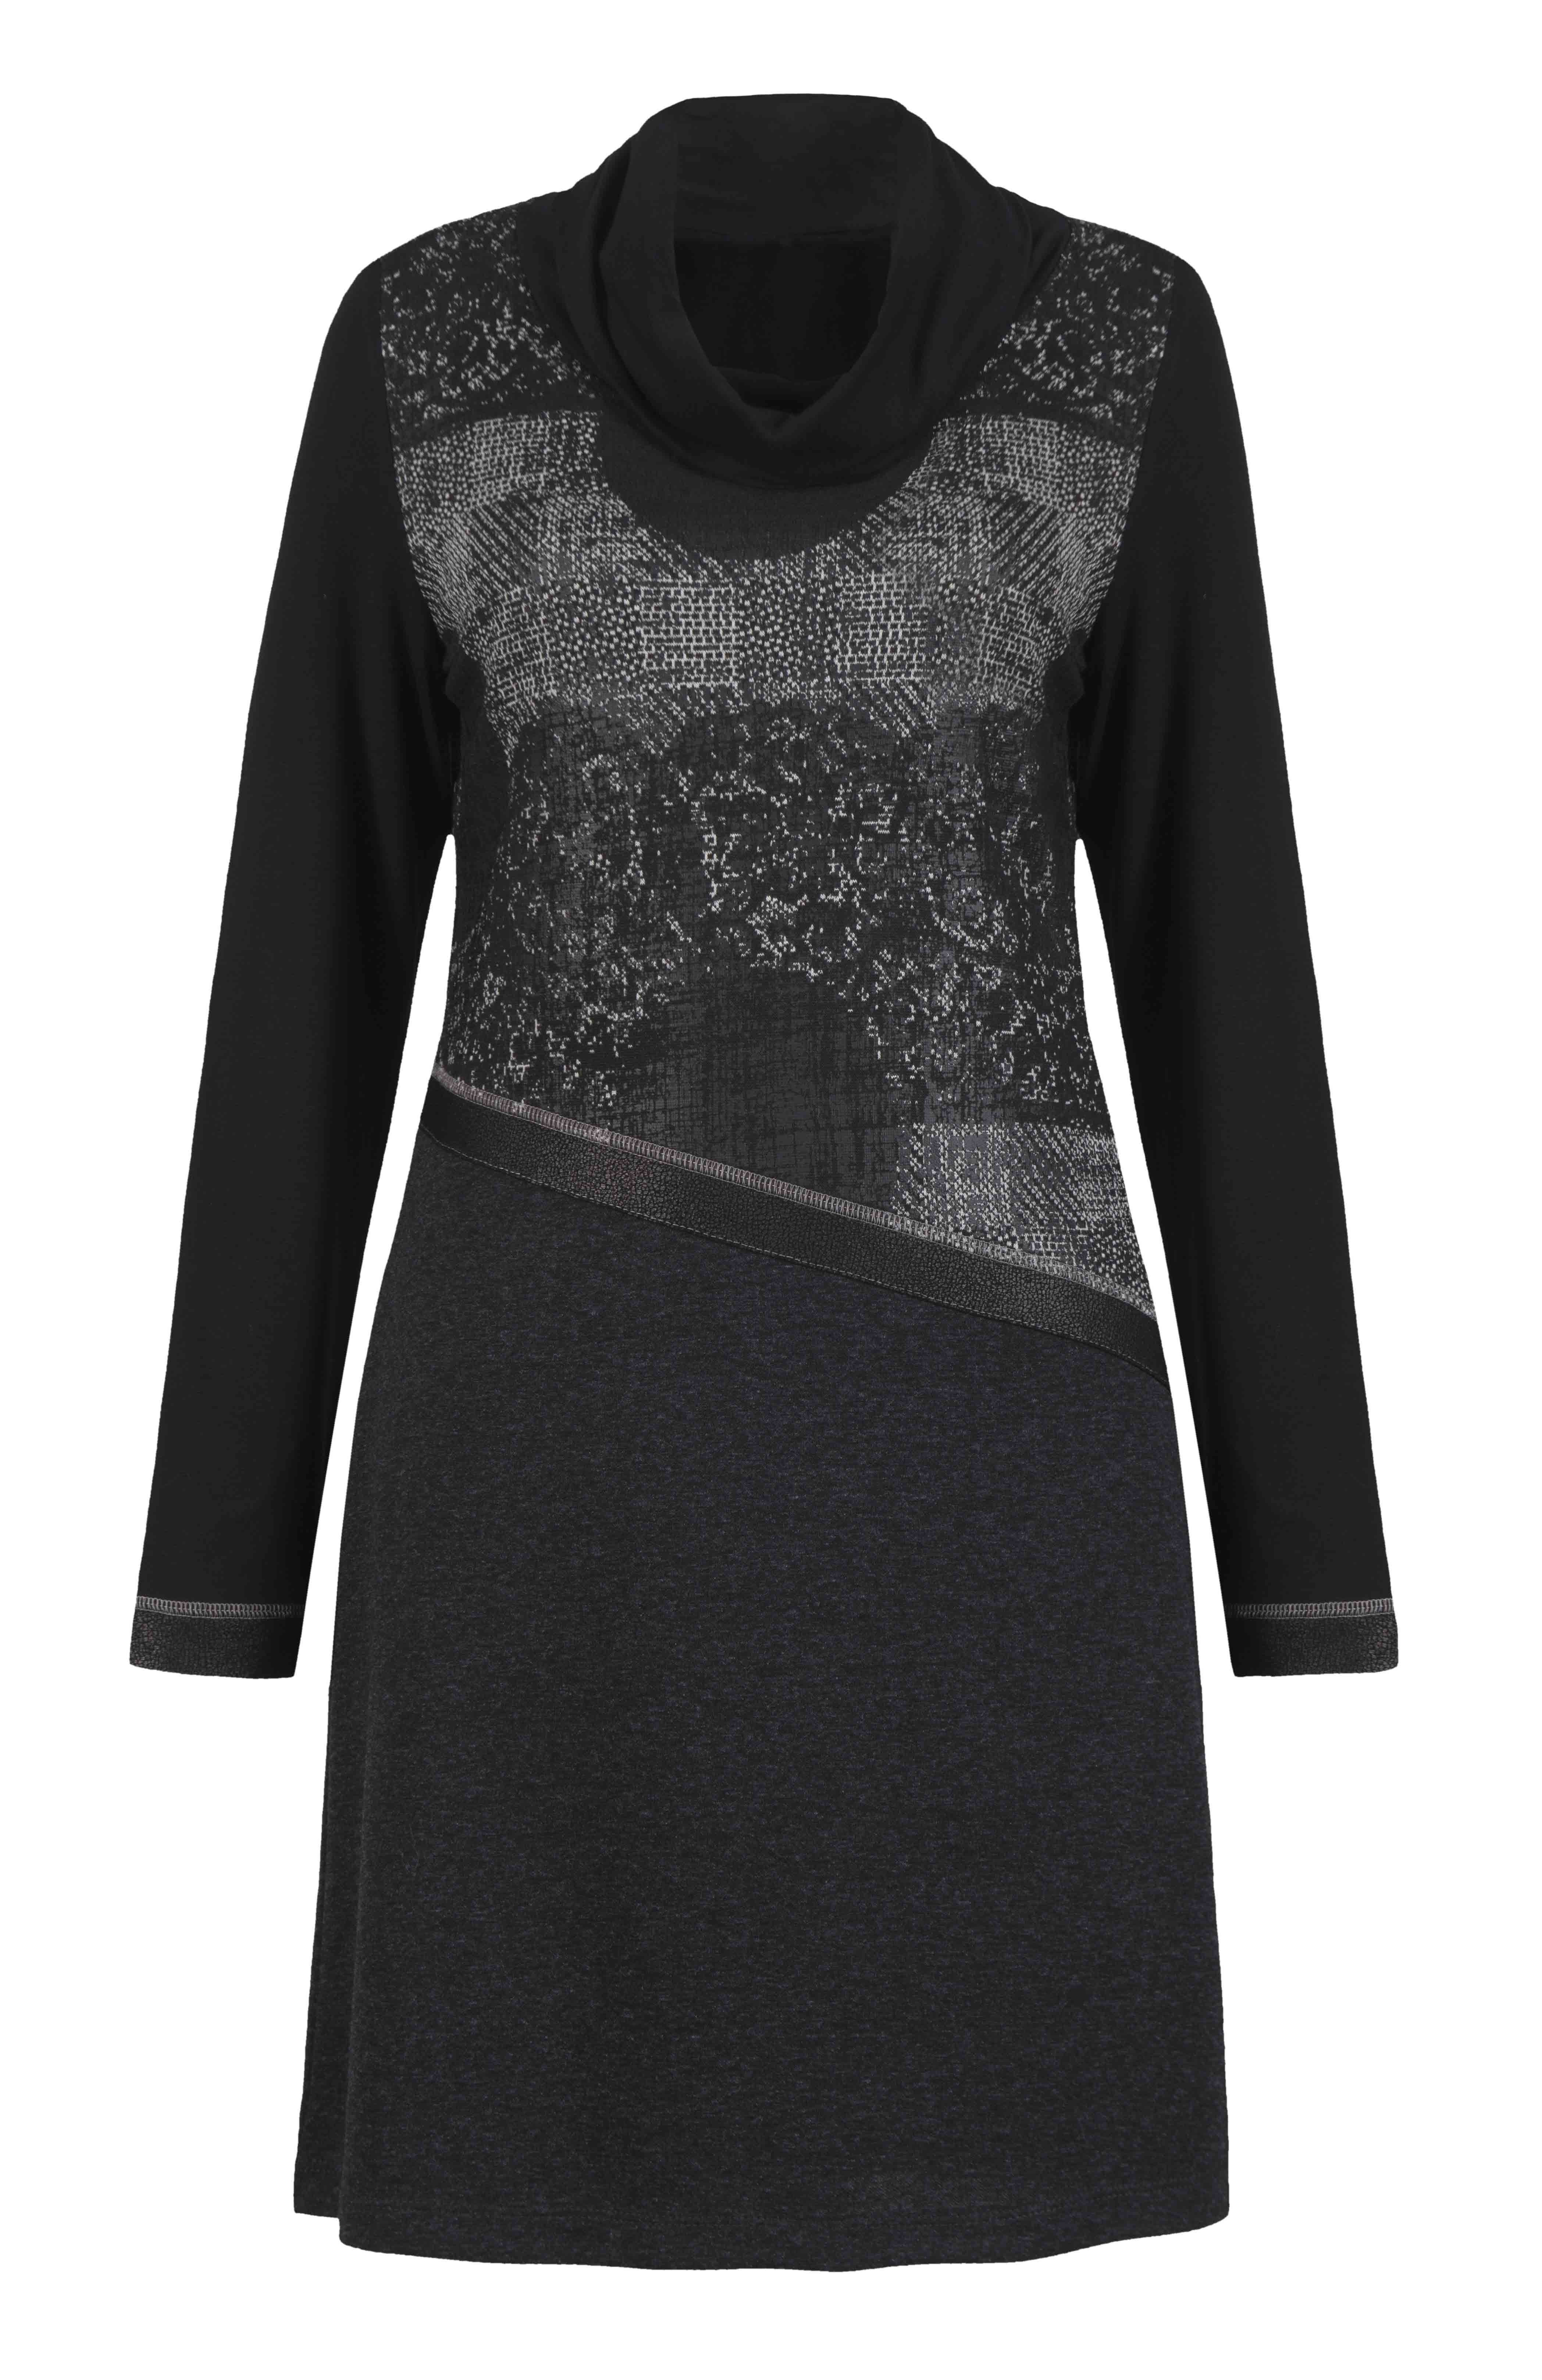 Dolcezza: Asymmetrical Ribboned Waist Dress/Tunic (1 Left!)